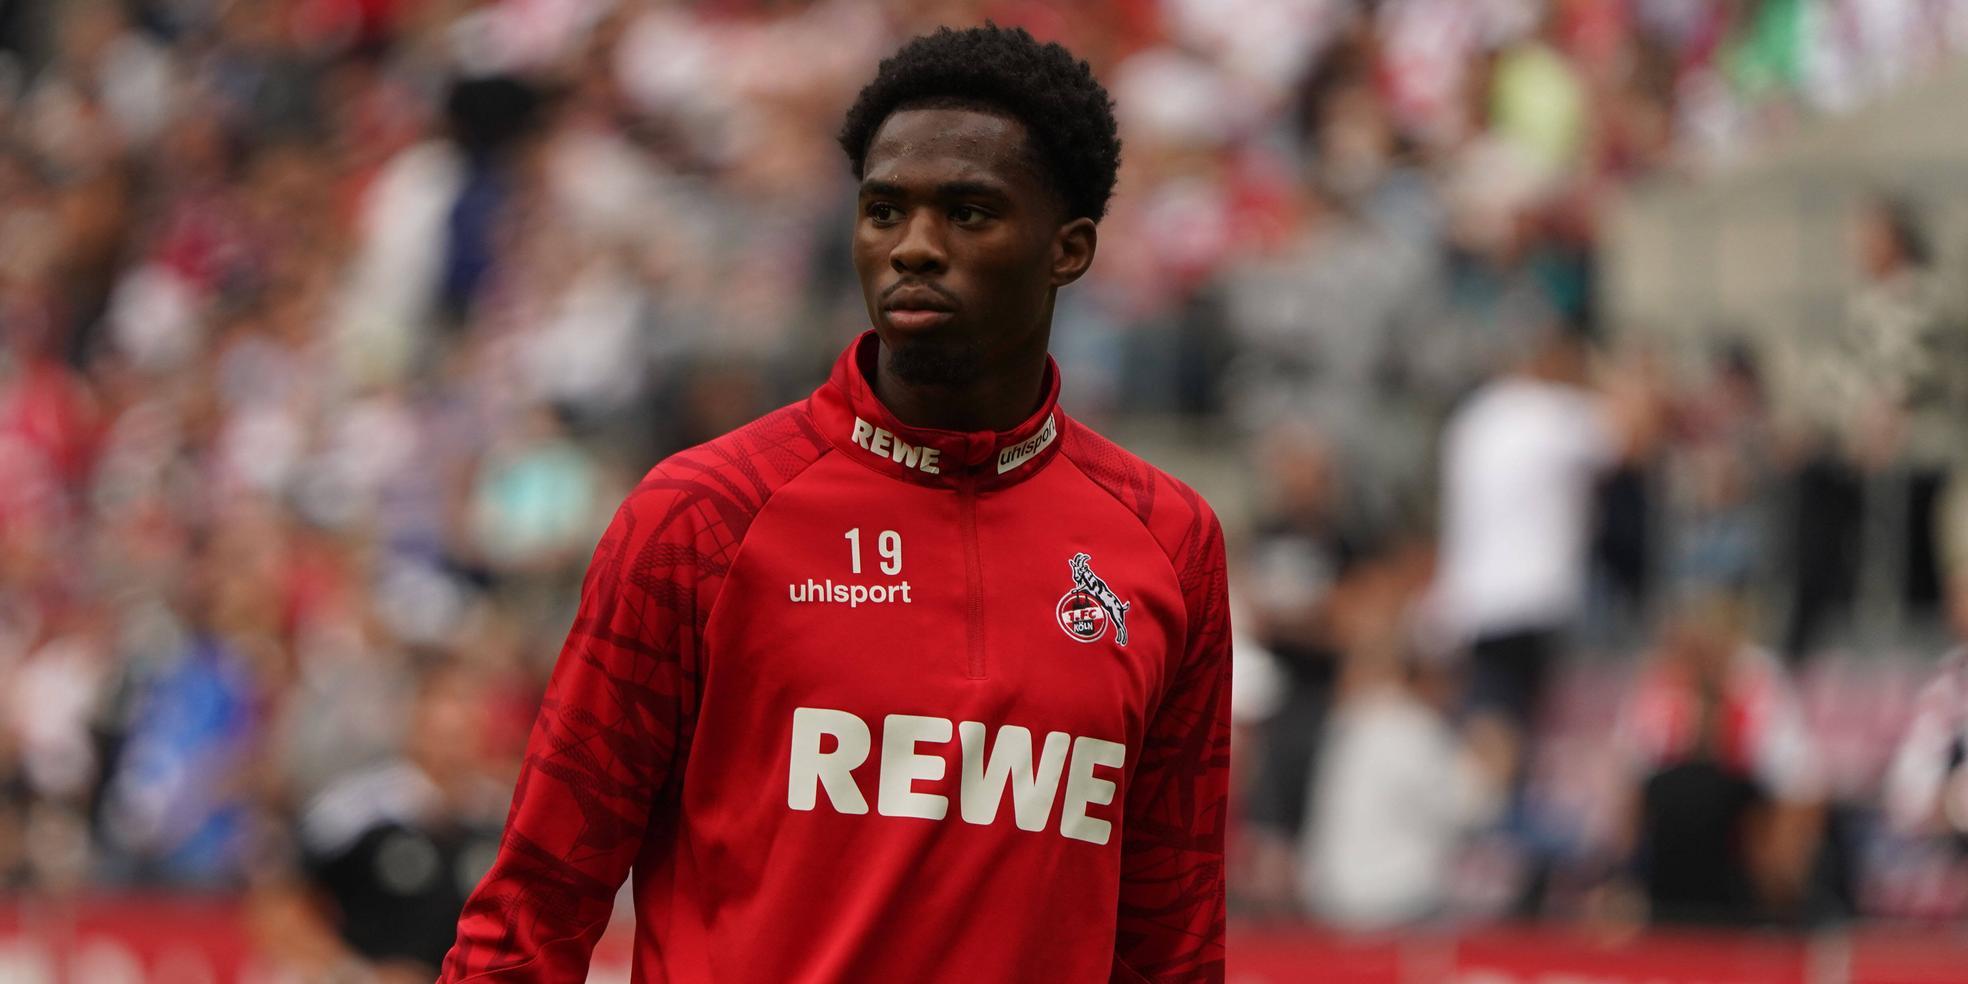 Kingsley Ehizibue vom 1. FC Köln